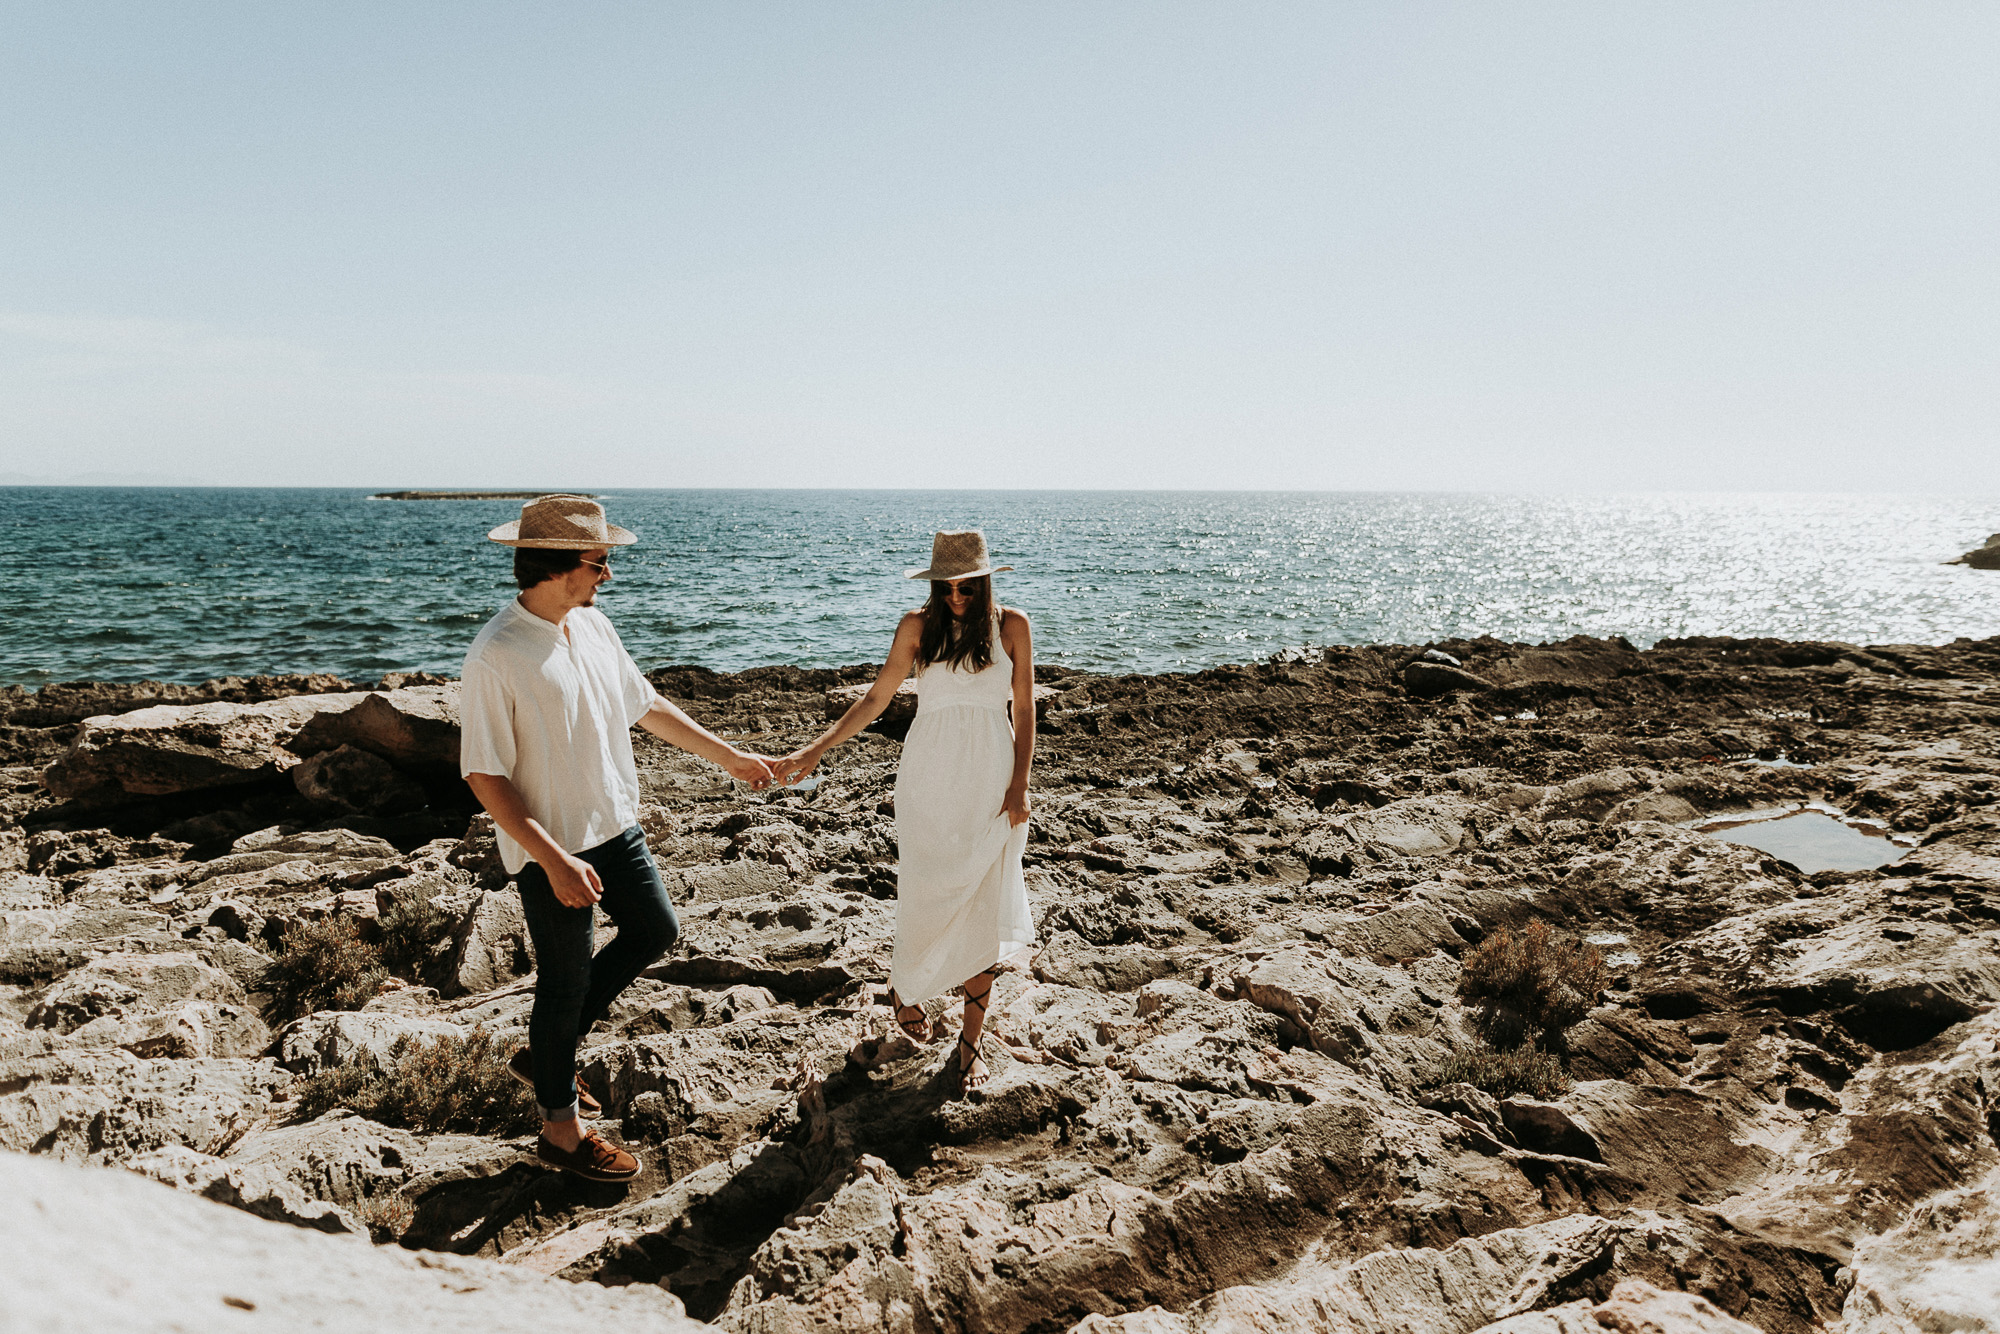 DanielaMarquardtPhotography_wedding_elopement_mallorca_spain_stjordi_sessalines_marinaandxavi351